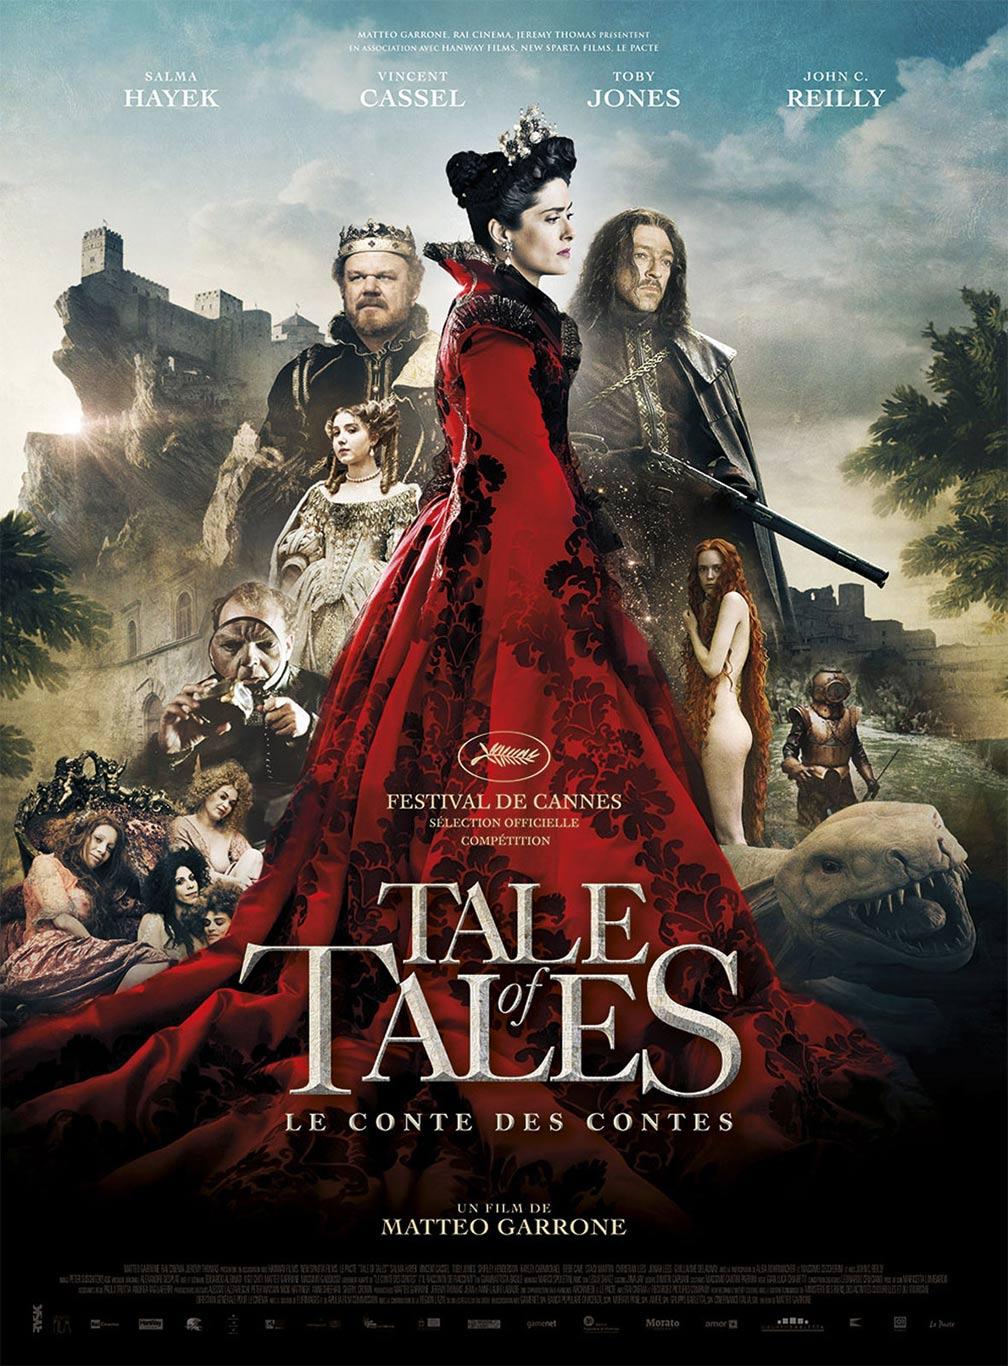 tale-of-tales-poster.jpg